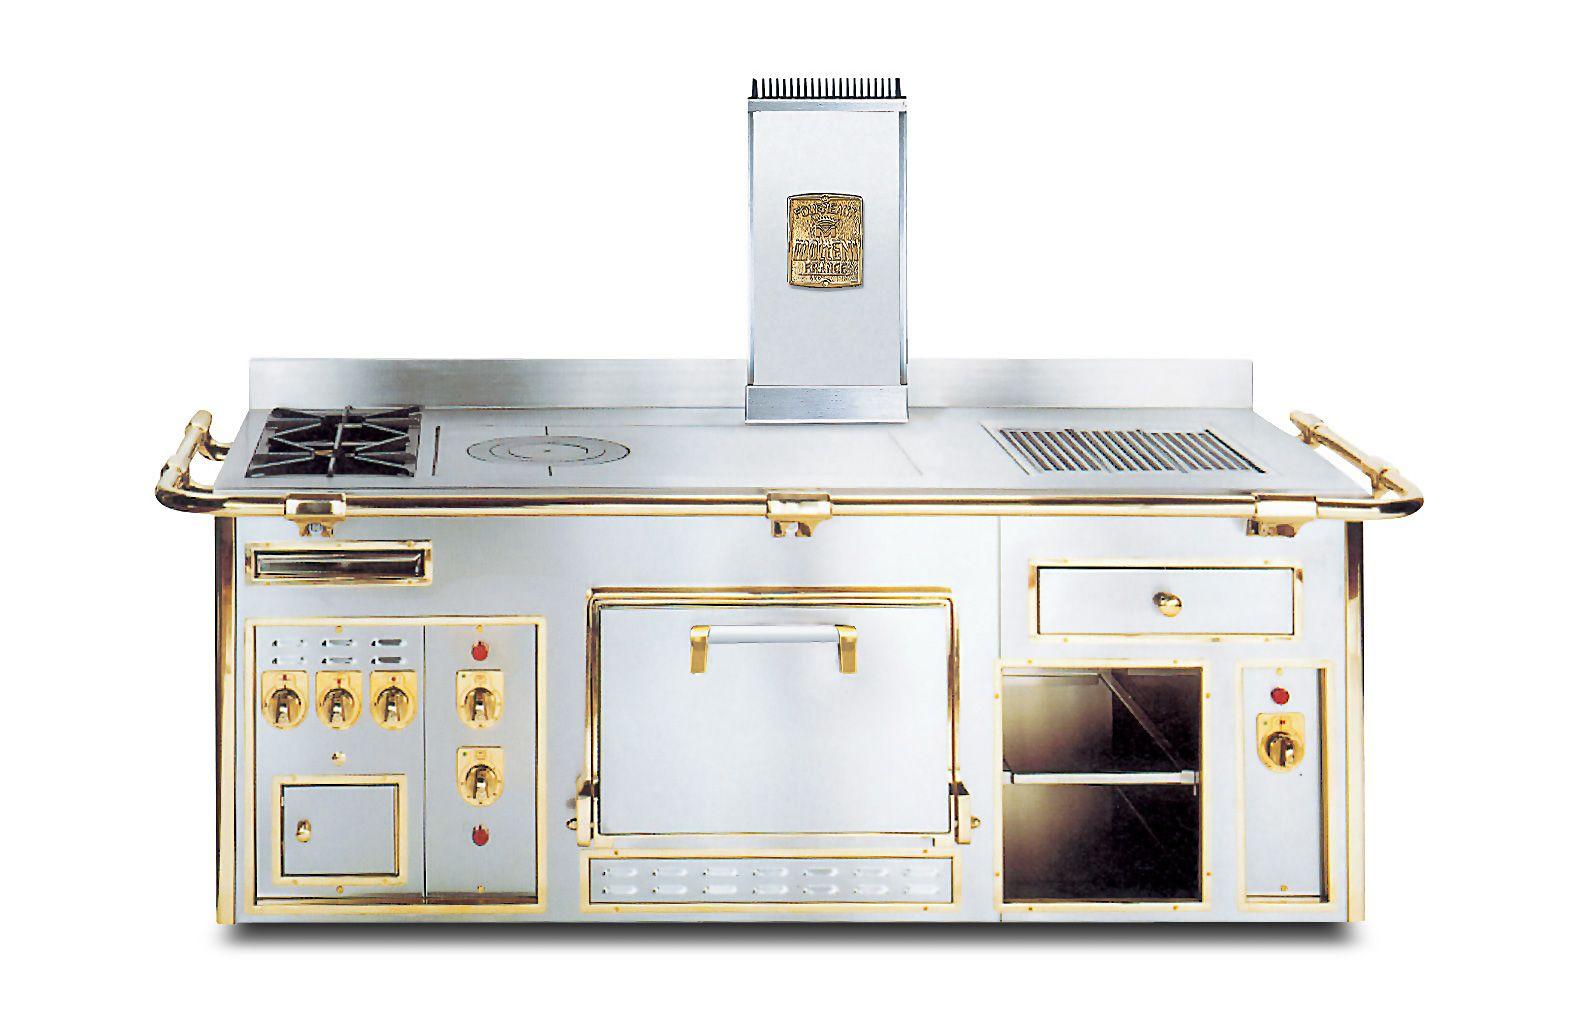 Molteni   K O K E R D E T   Pinterest   Range cooker and Ranges